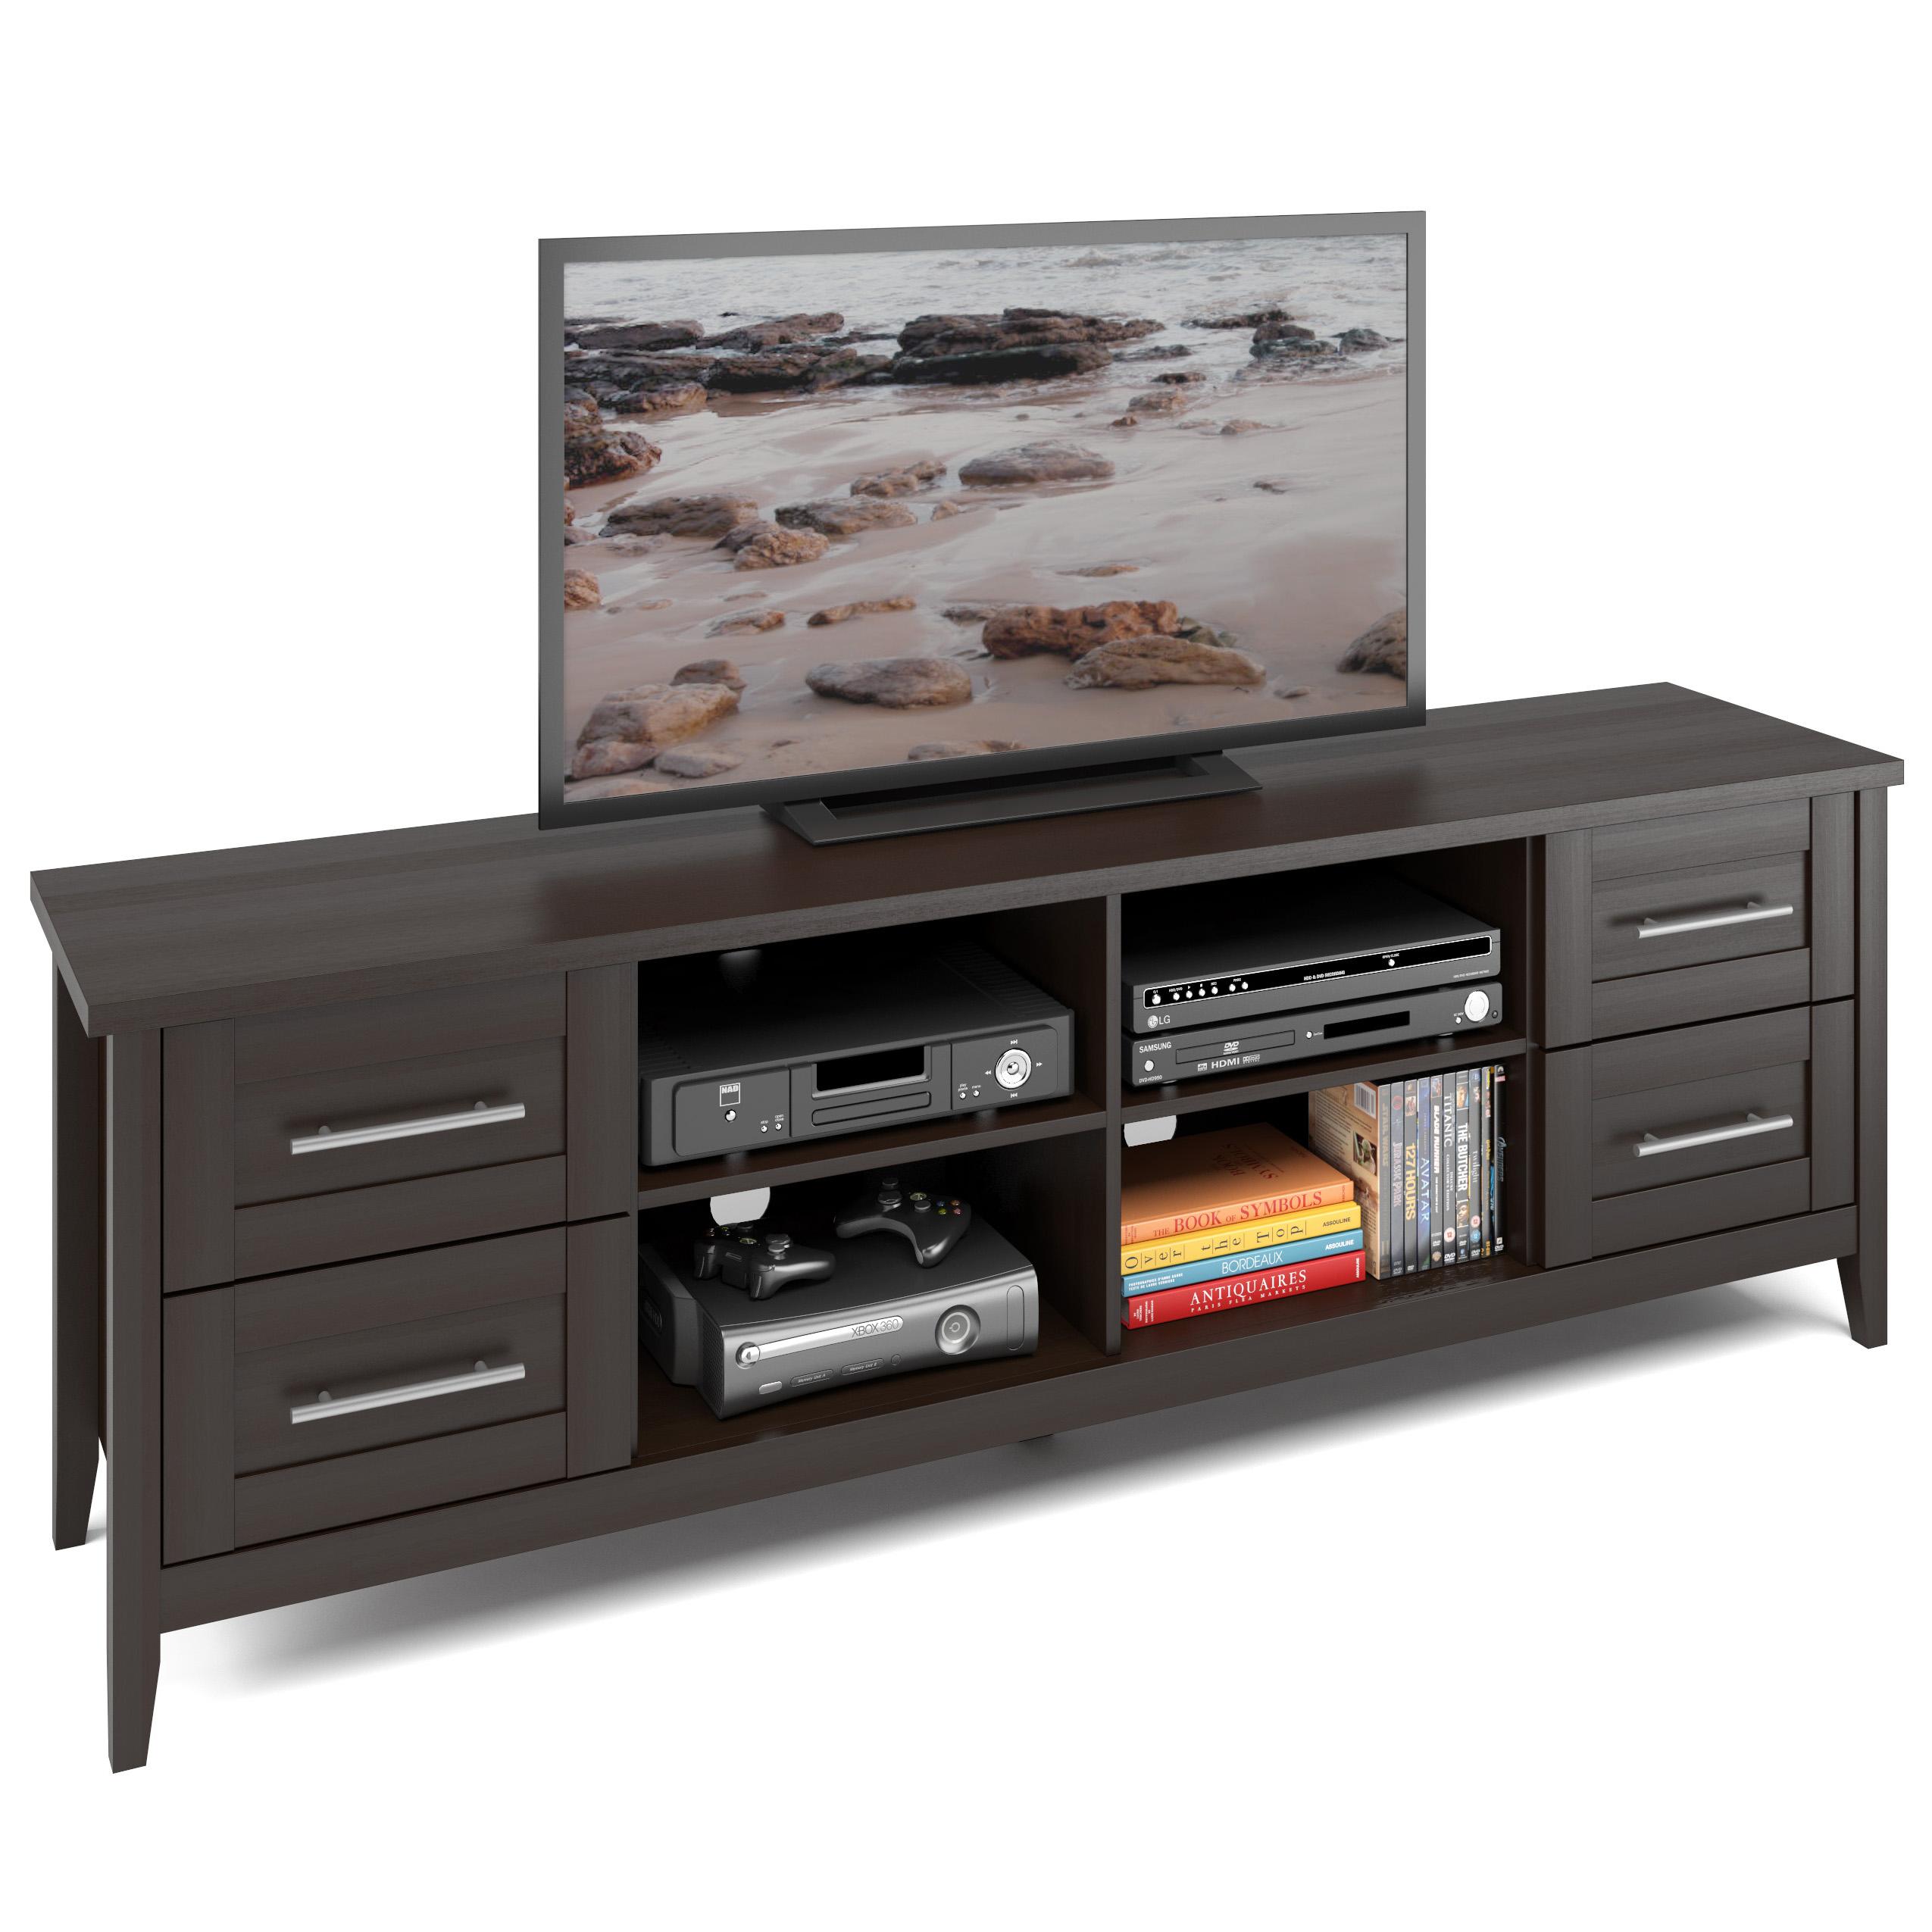 "CorLiving Jackson Espresso 4-Drawer TV Bench for TVs up to 80"""